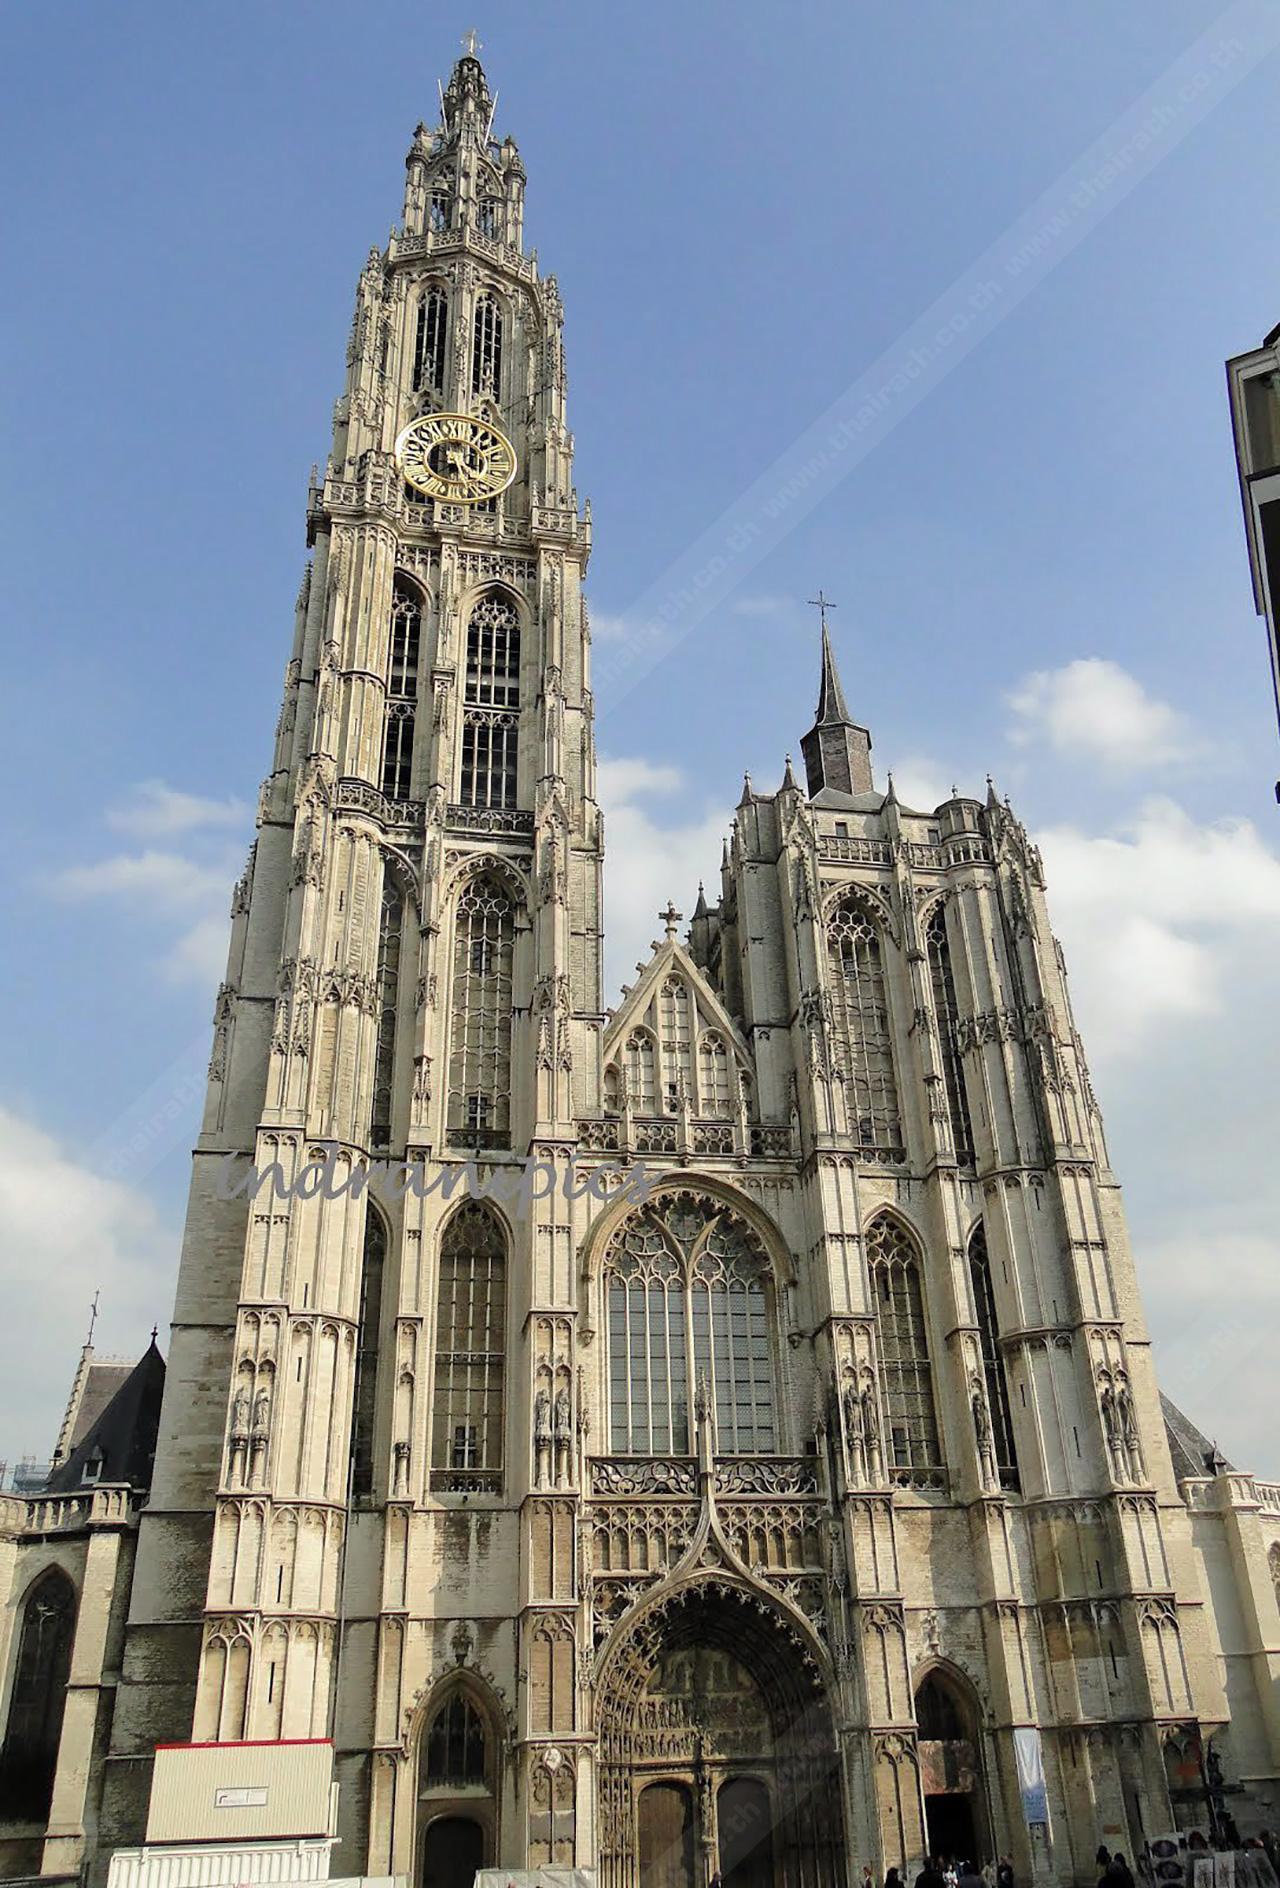 Cathedral of our Lady... มหาวิหารแห่ง แอนท์เวิร์ป.